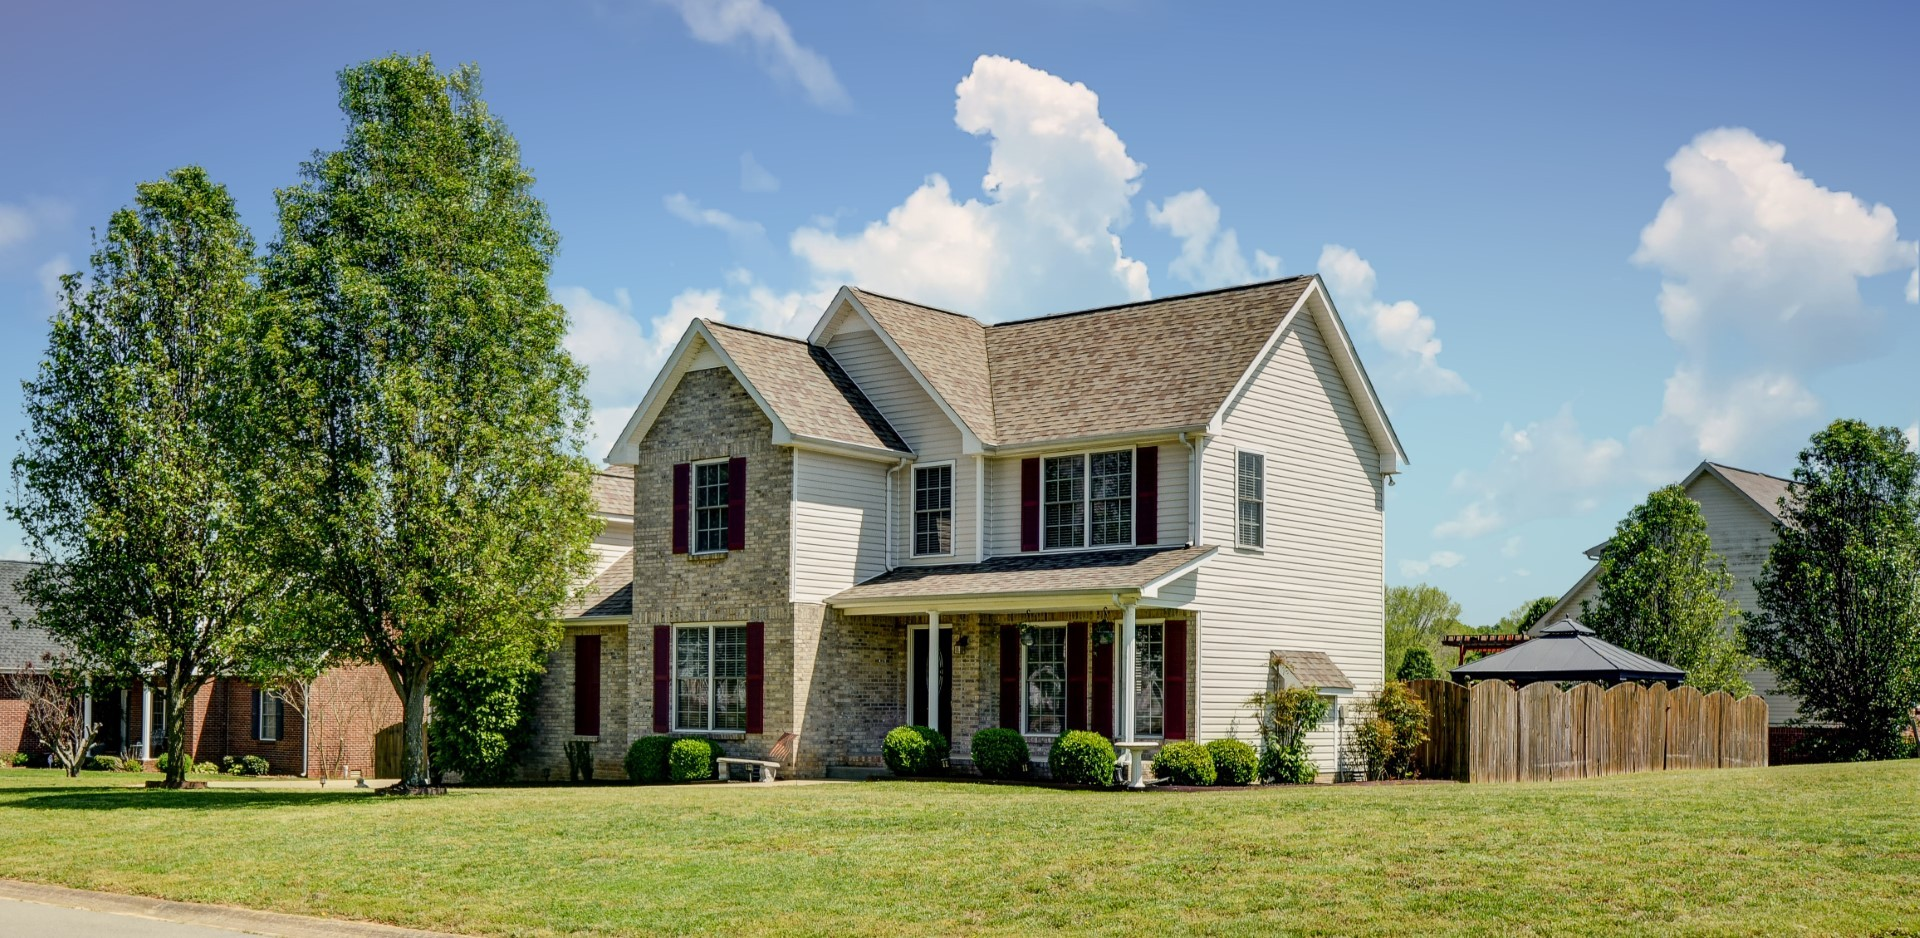 3572 Rabbit Run Trl, Adams, TN 37010 - Adams, TN real estate listing